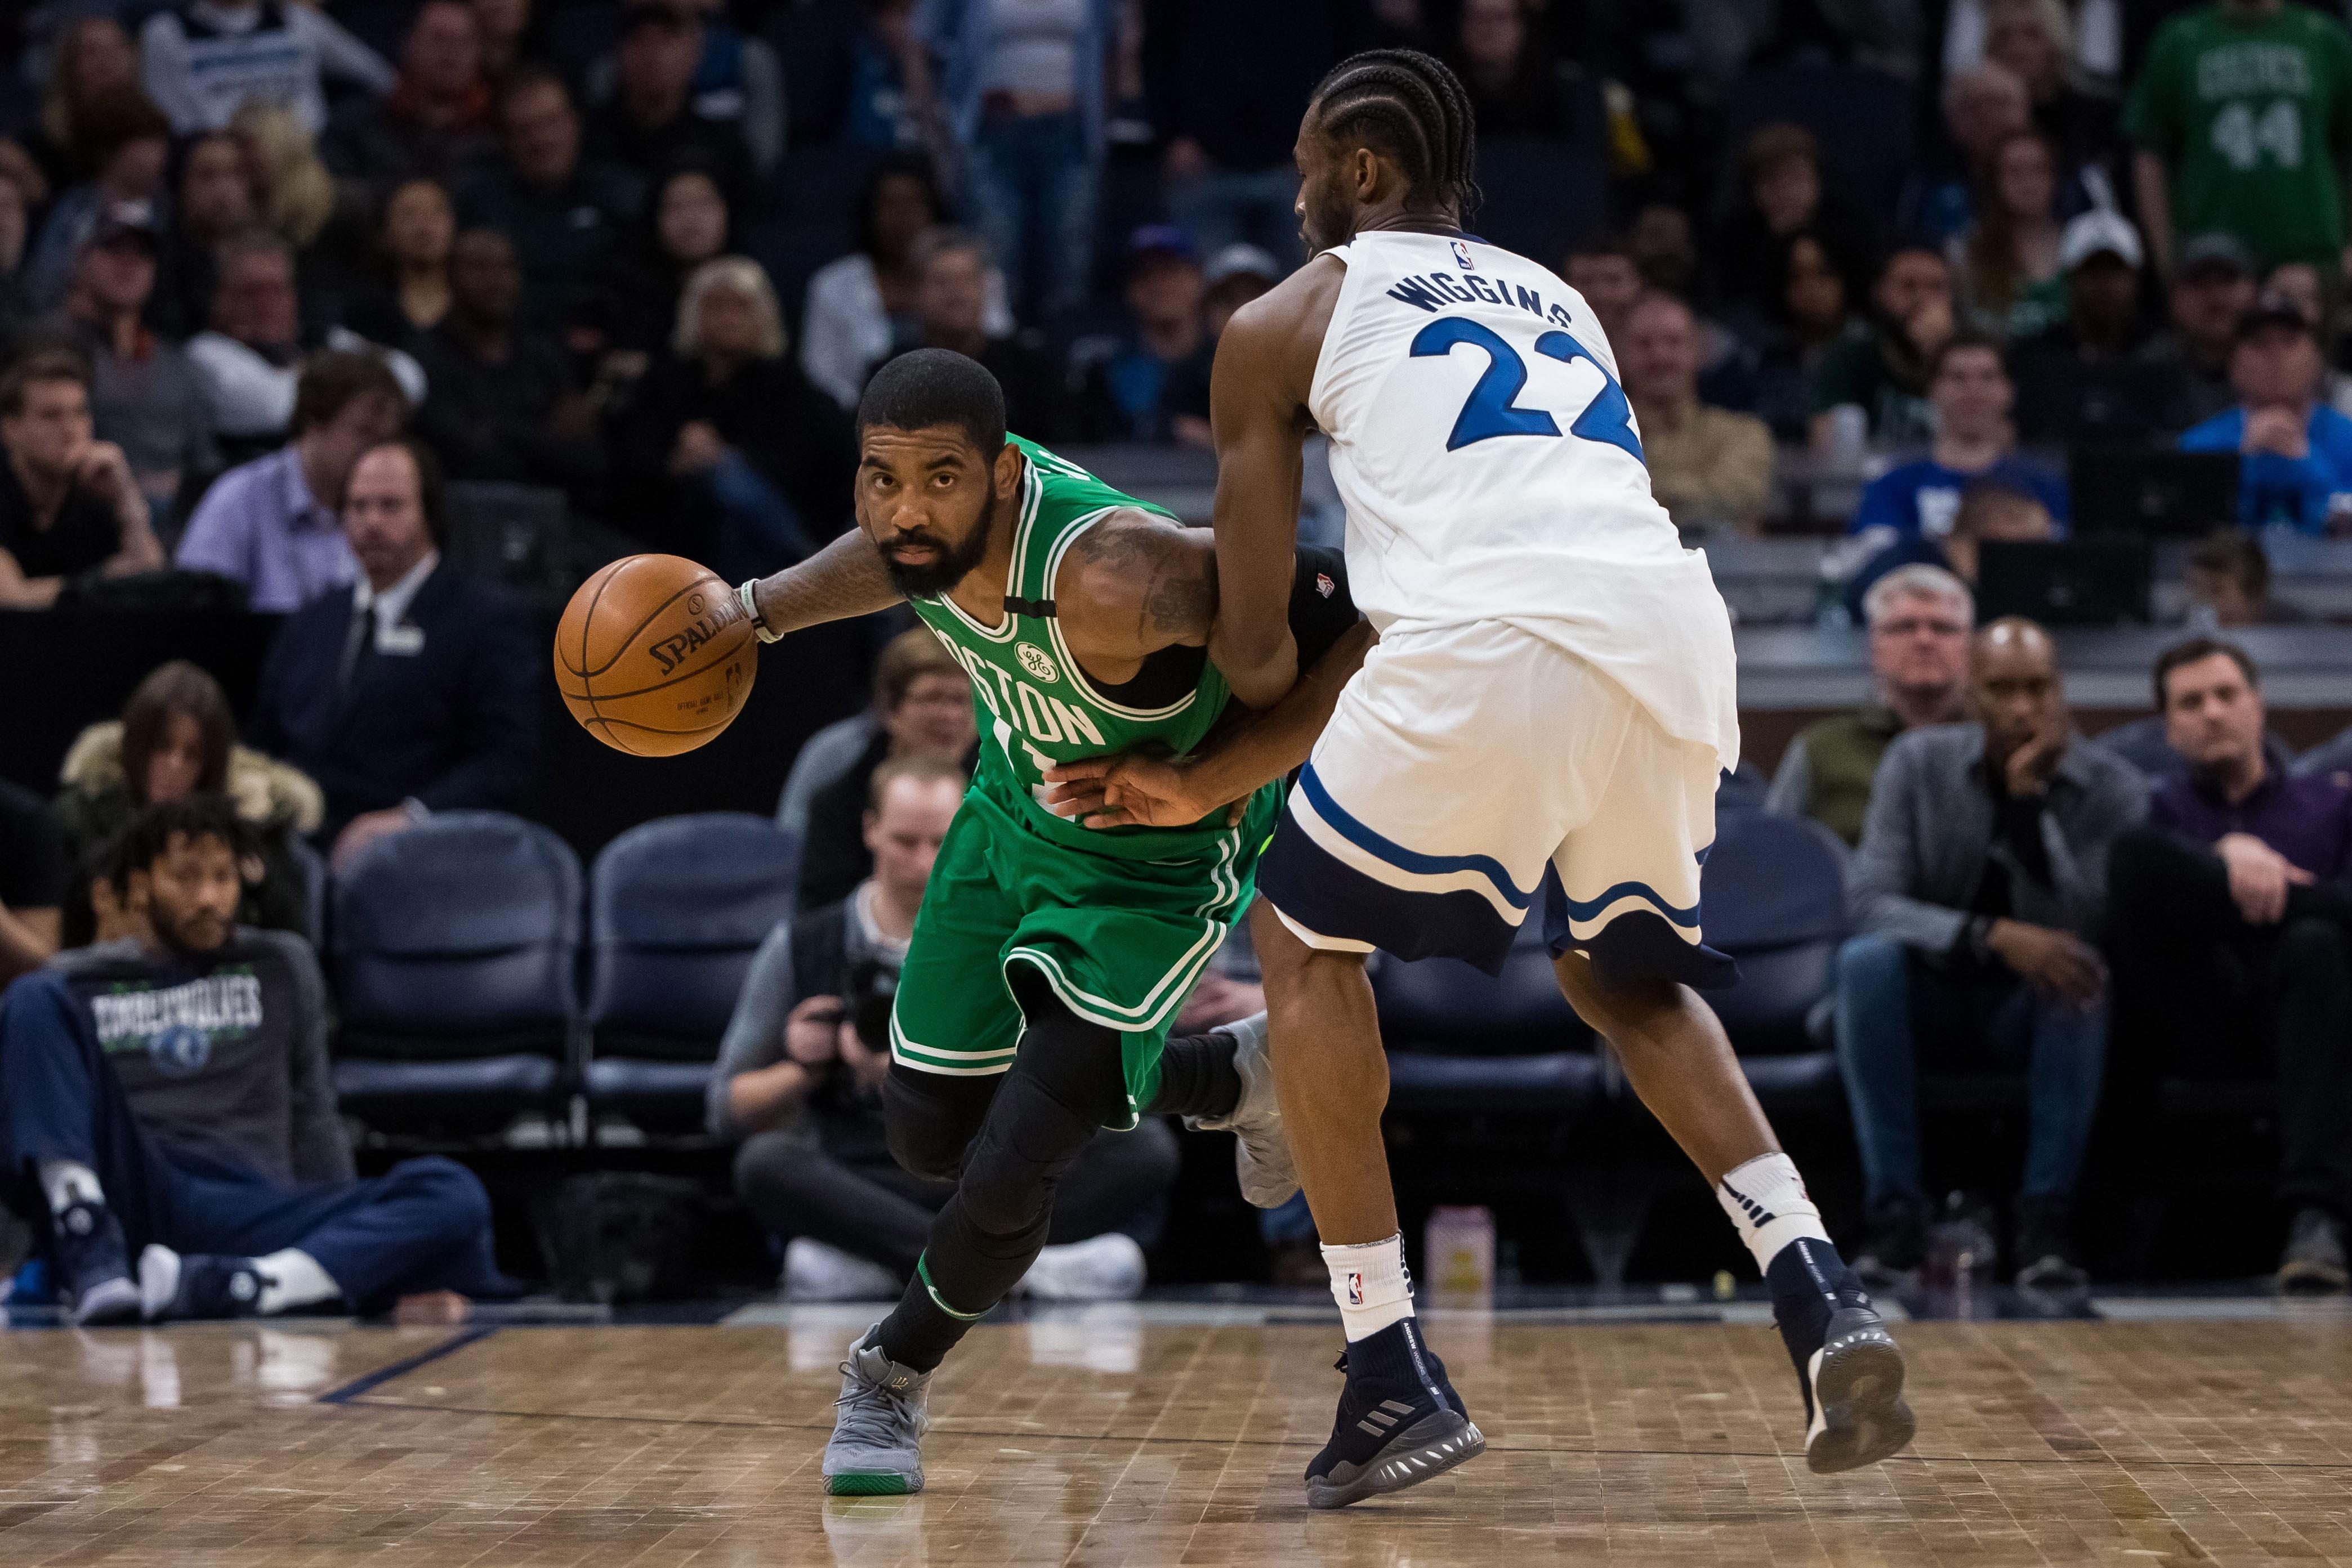 2018-03-09T040154Z_689291744_NOCID_RTRMADP_3_NBA-BOSTON-CELTICS-AT-MINNESOTA-TIMBERWOLVES